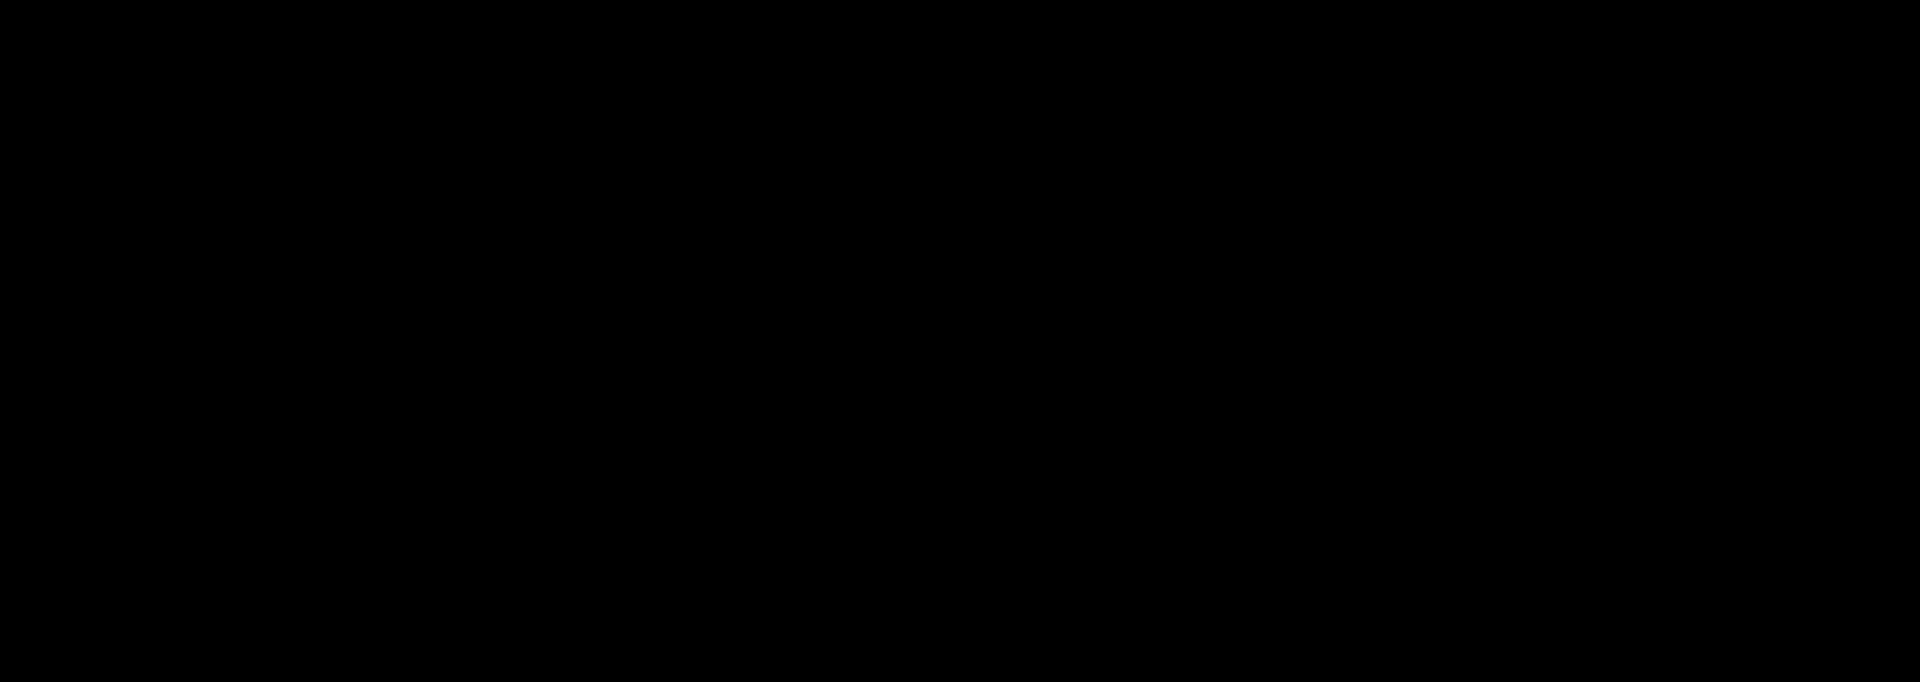 ROEMY-banner